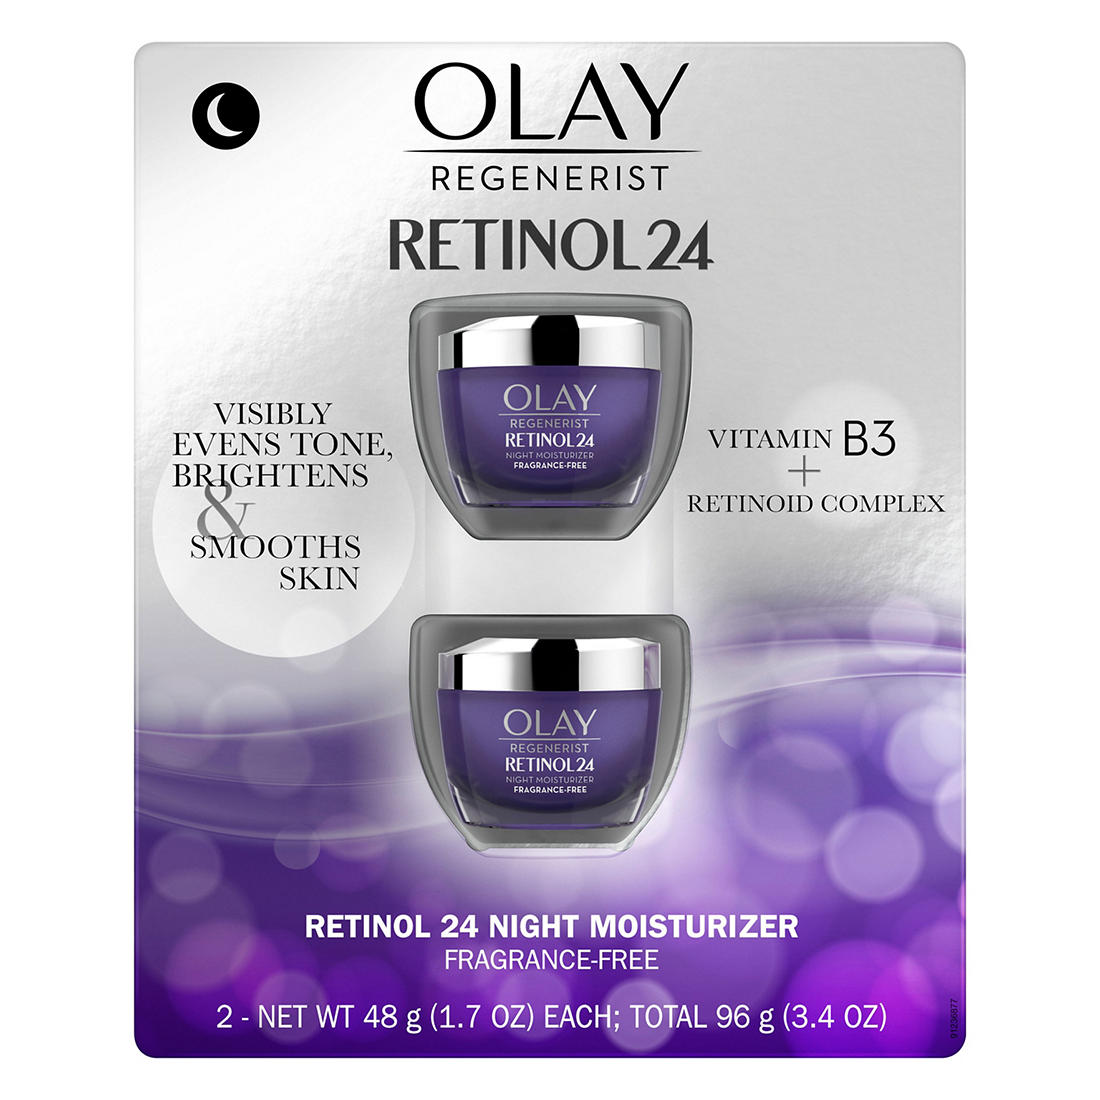 Olay Regenerist Retinol 24 Facial Moisturizer 2 Pk Bjs